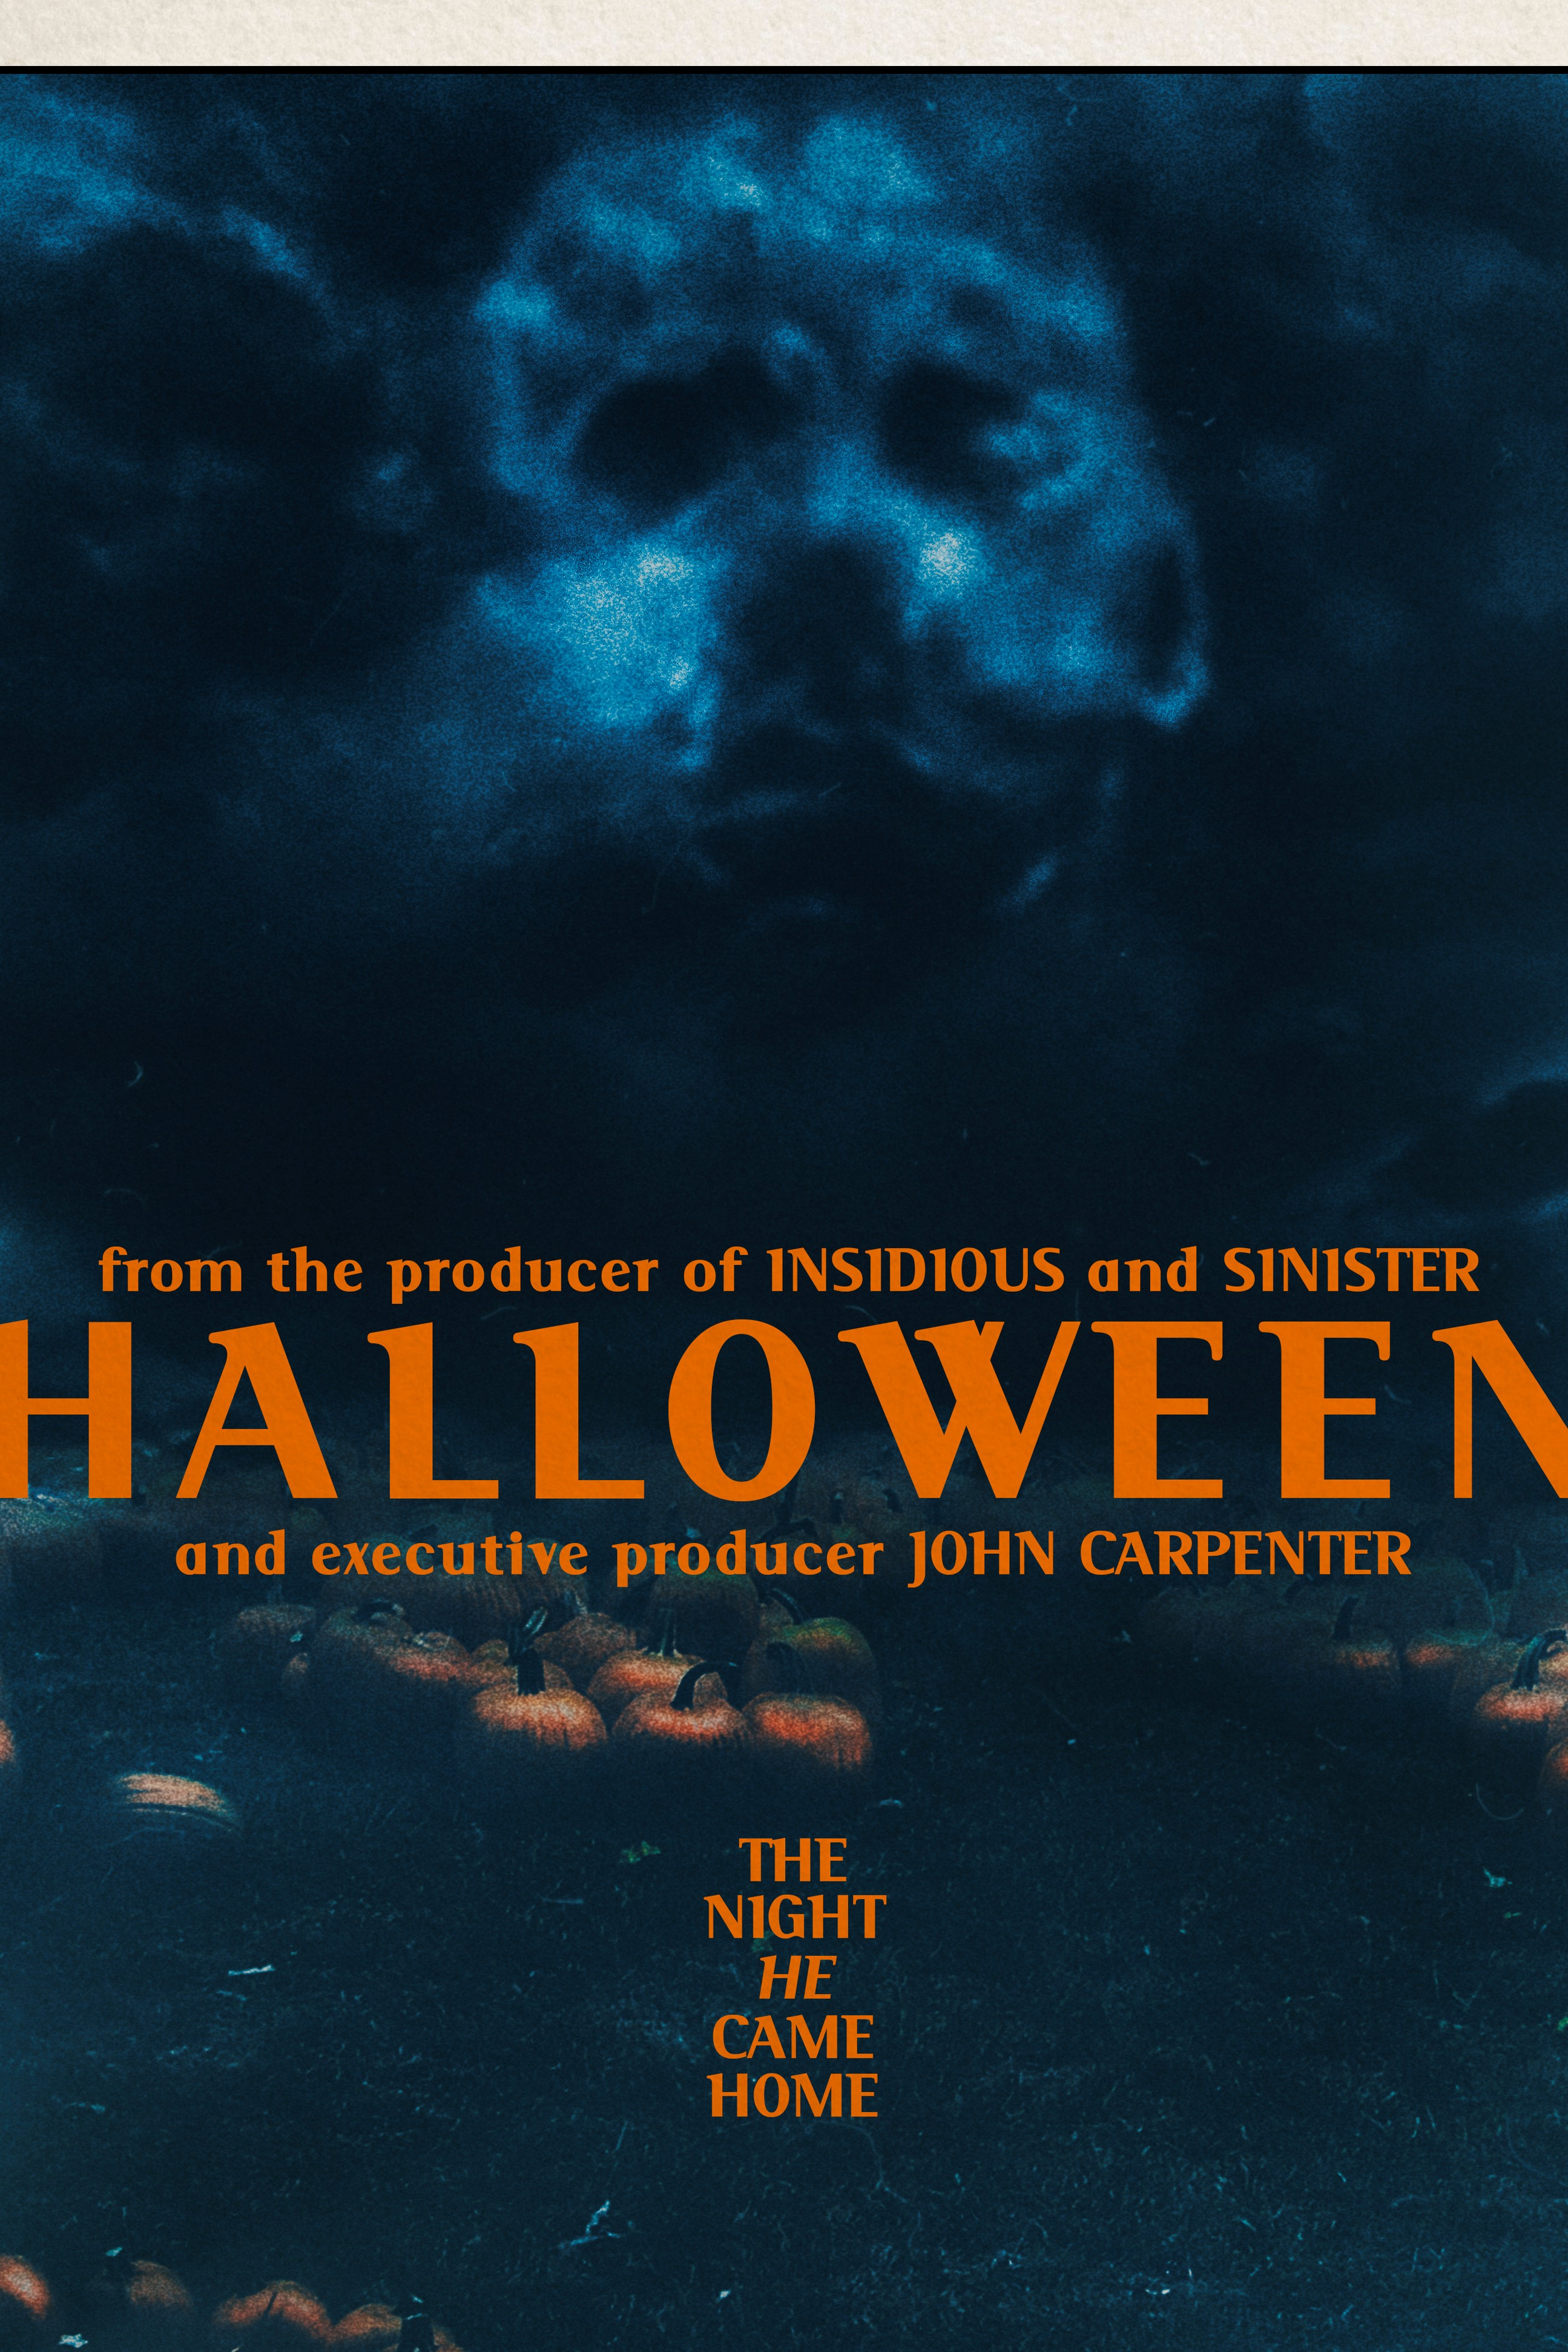 Halloween Night (2018)